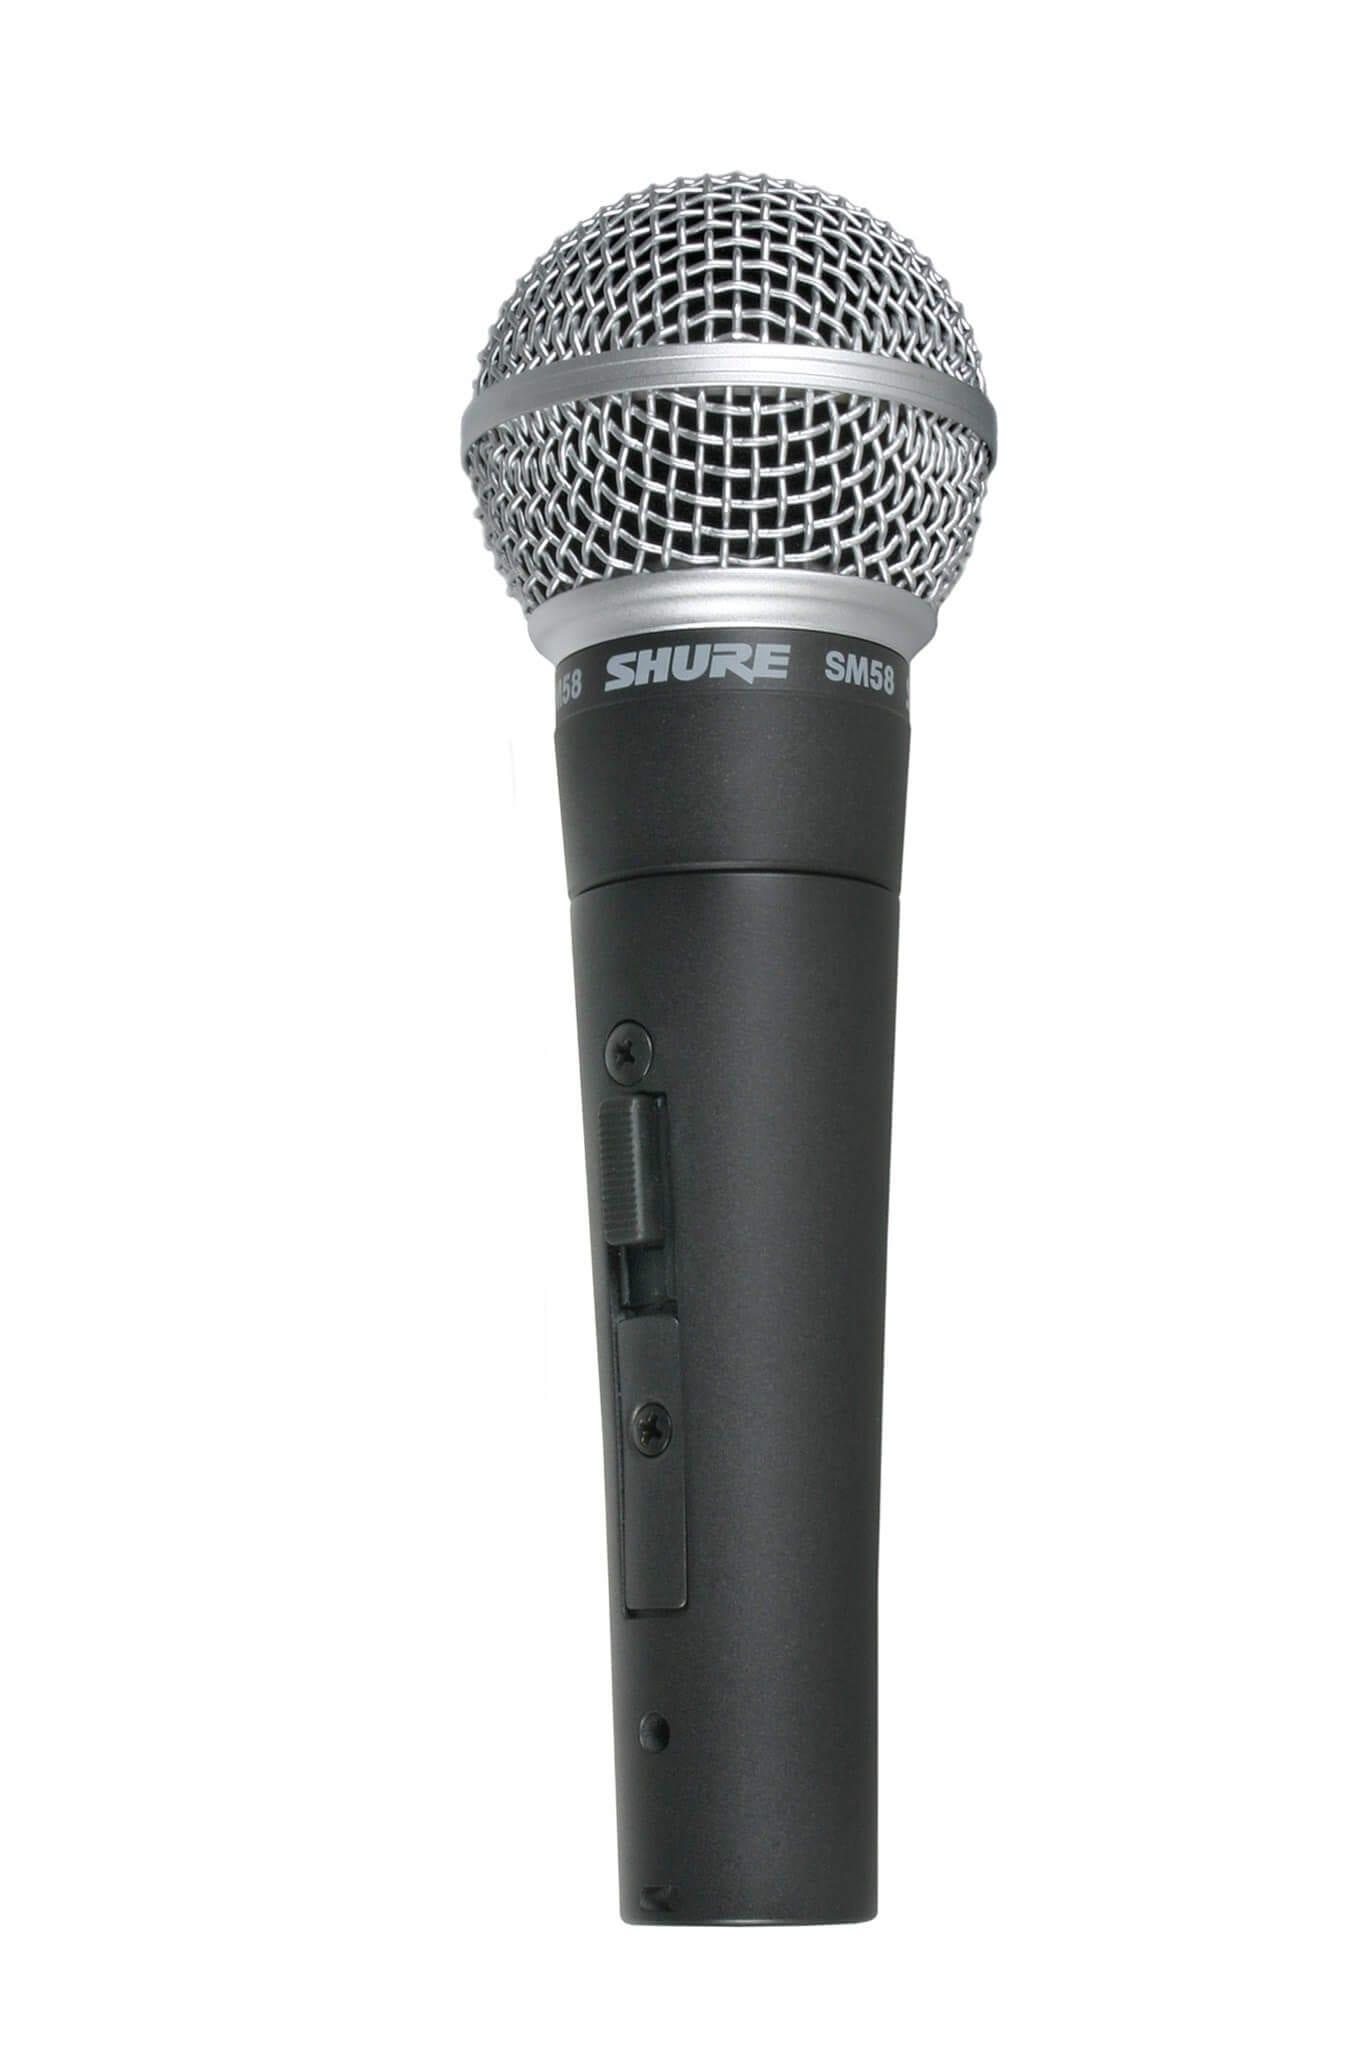 shure sm58 cardioid dynamic vocal microphone hytek electronics. Black Bedroom Furniture Sets. Home Design Ideas